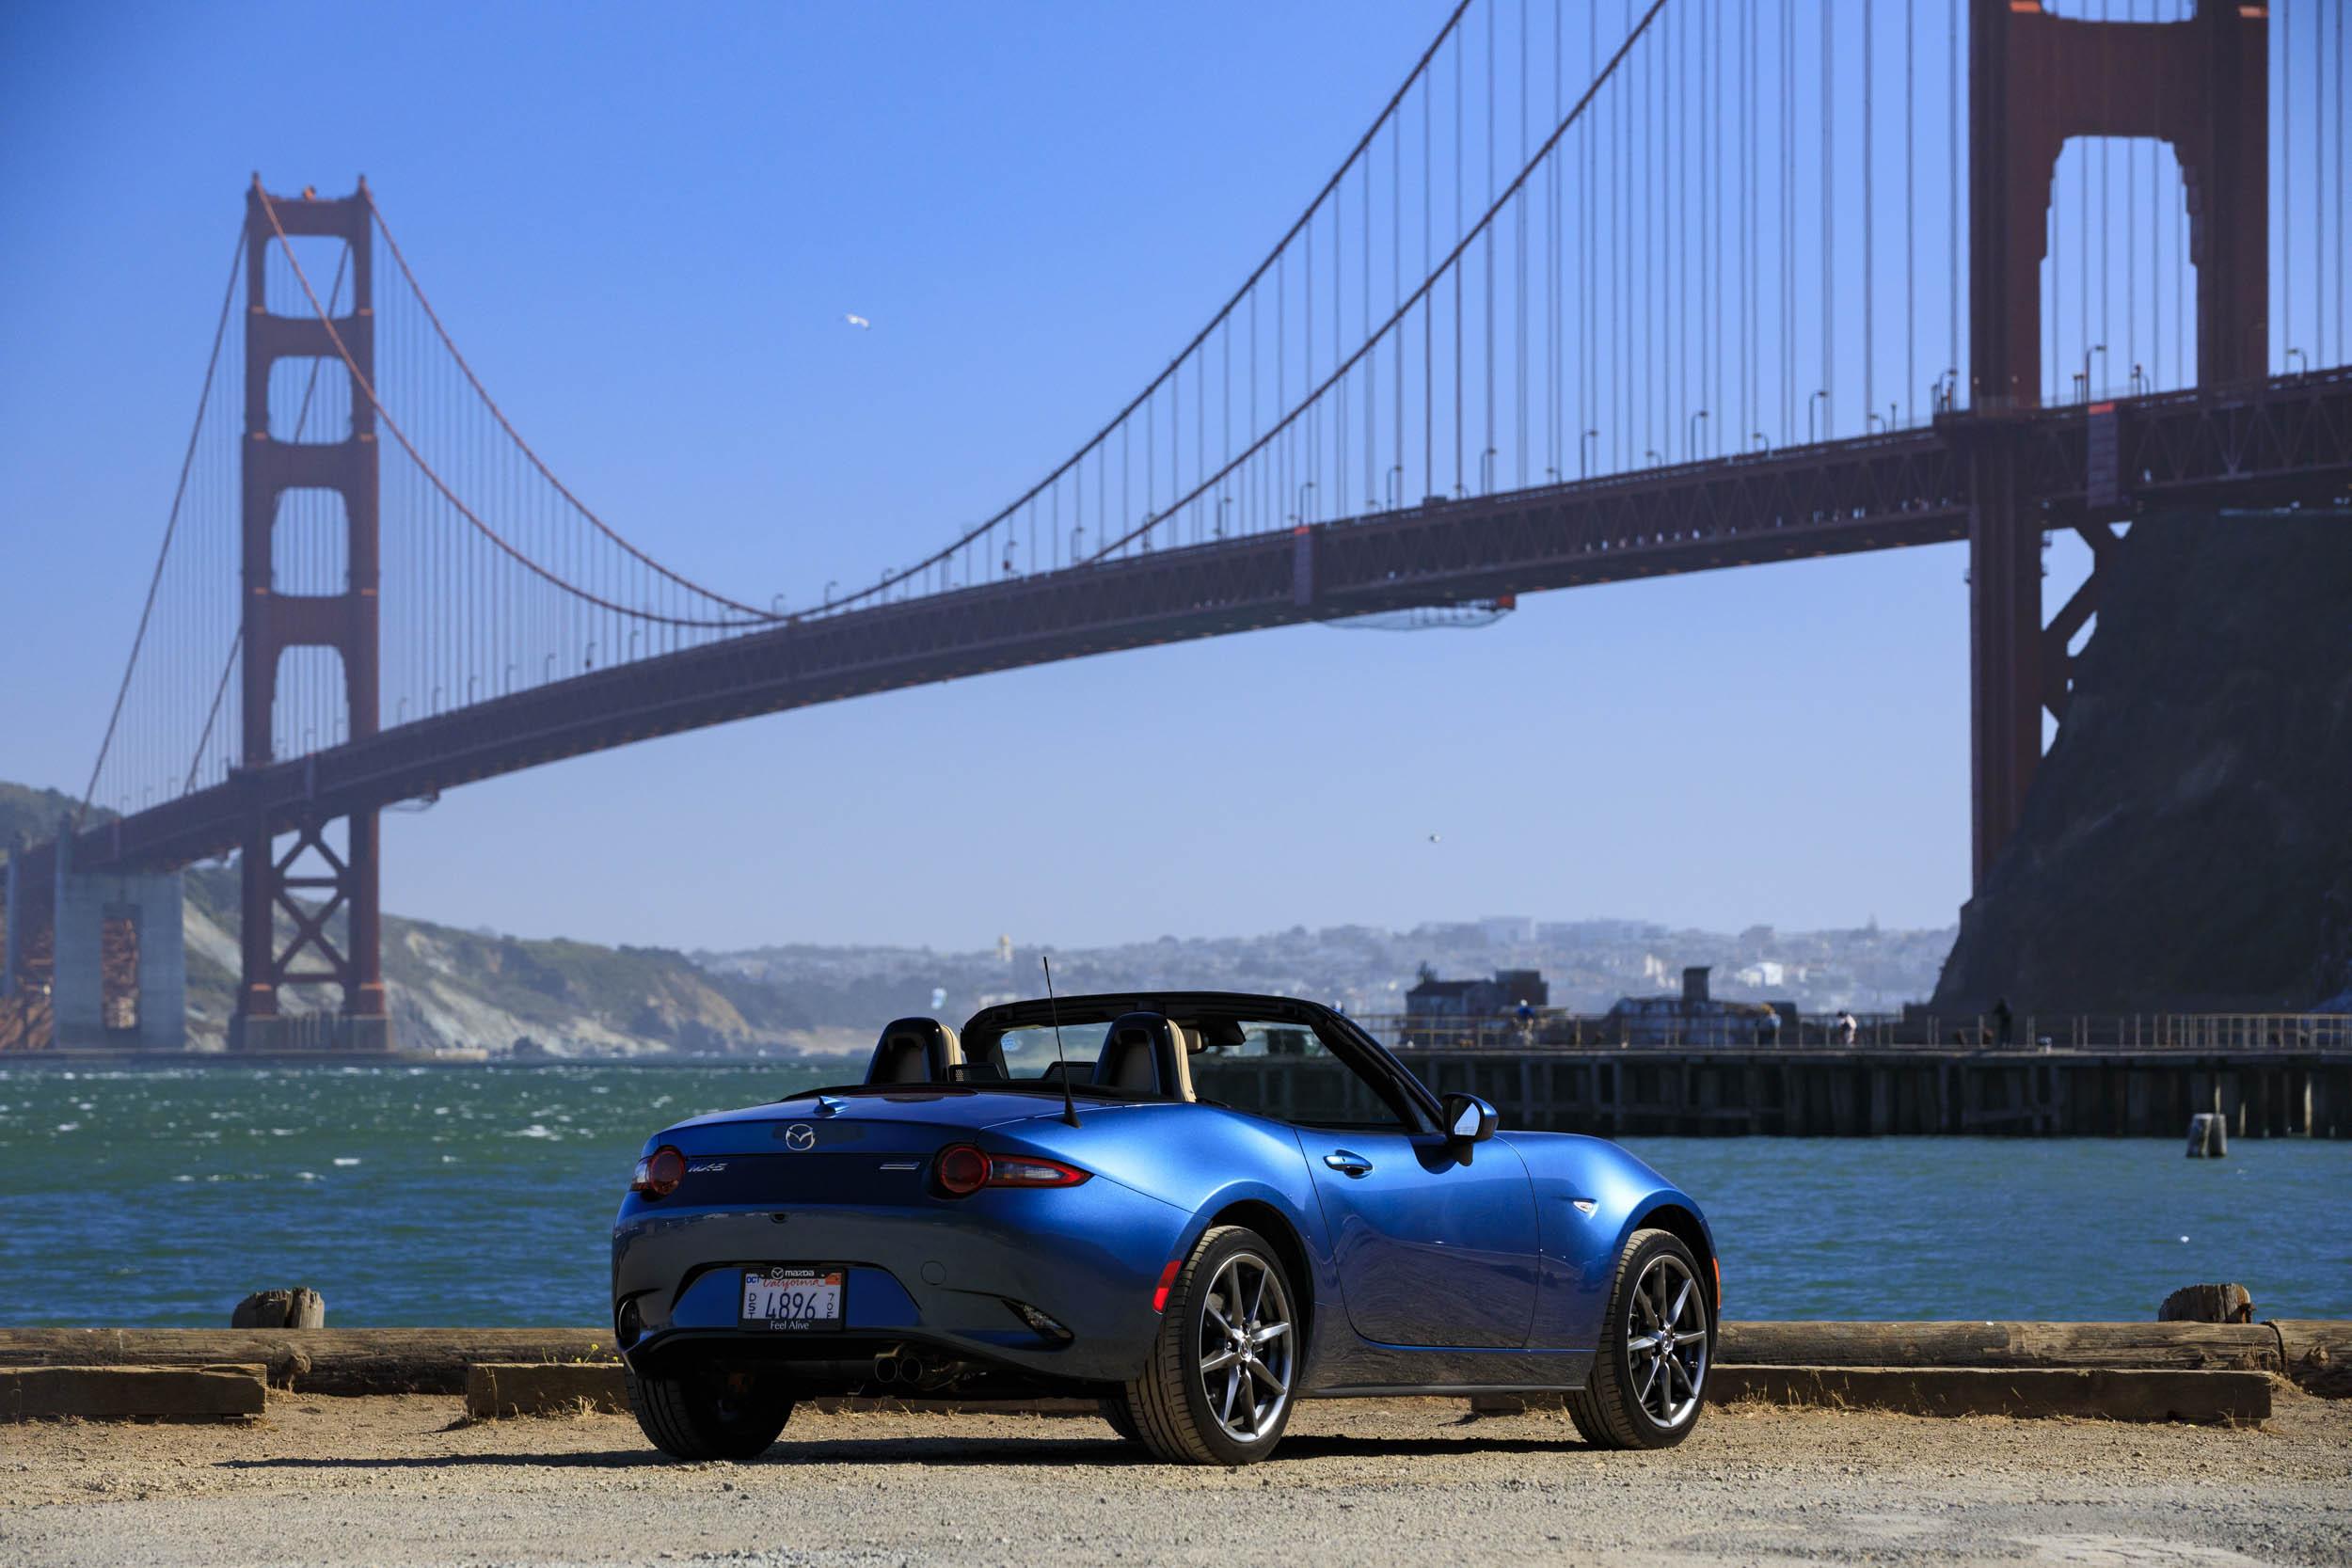 2019 Mazda MX-5 Miata Roadster rear 3/4 by the Golden Gate bridge